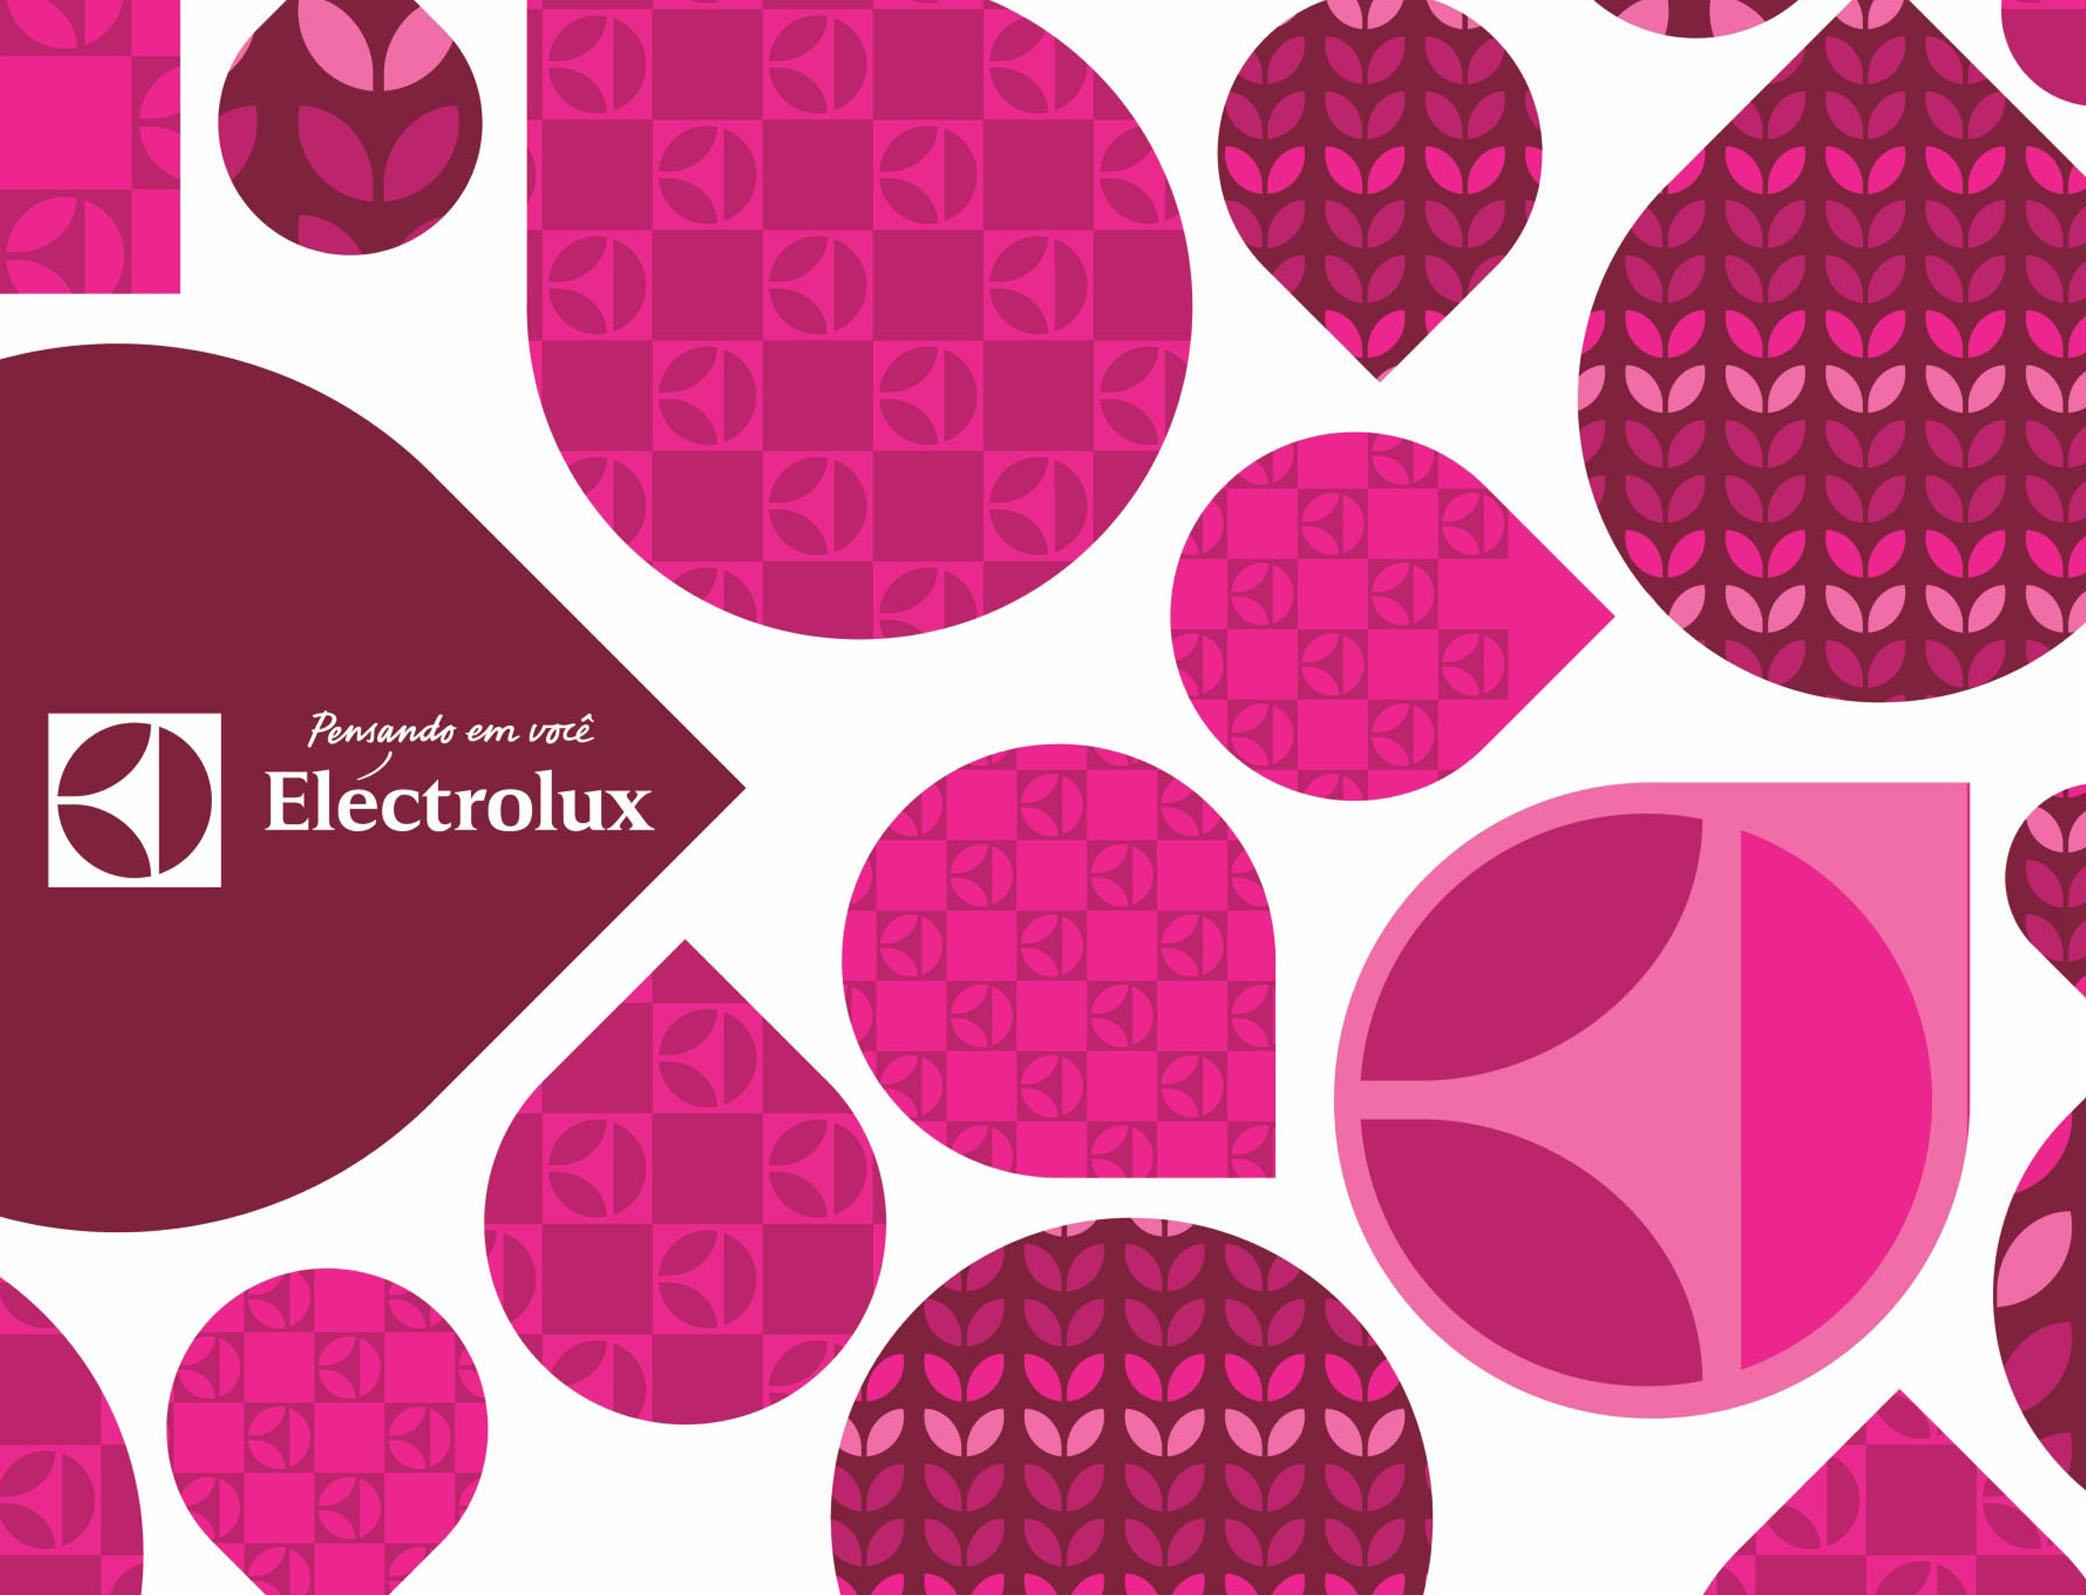 electrolux-adesivos-01b